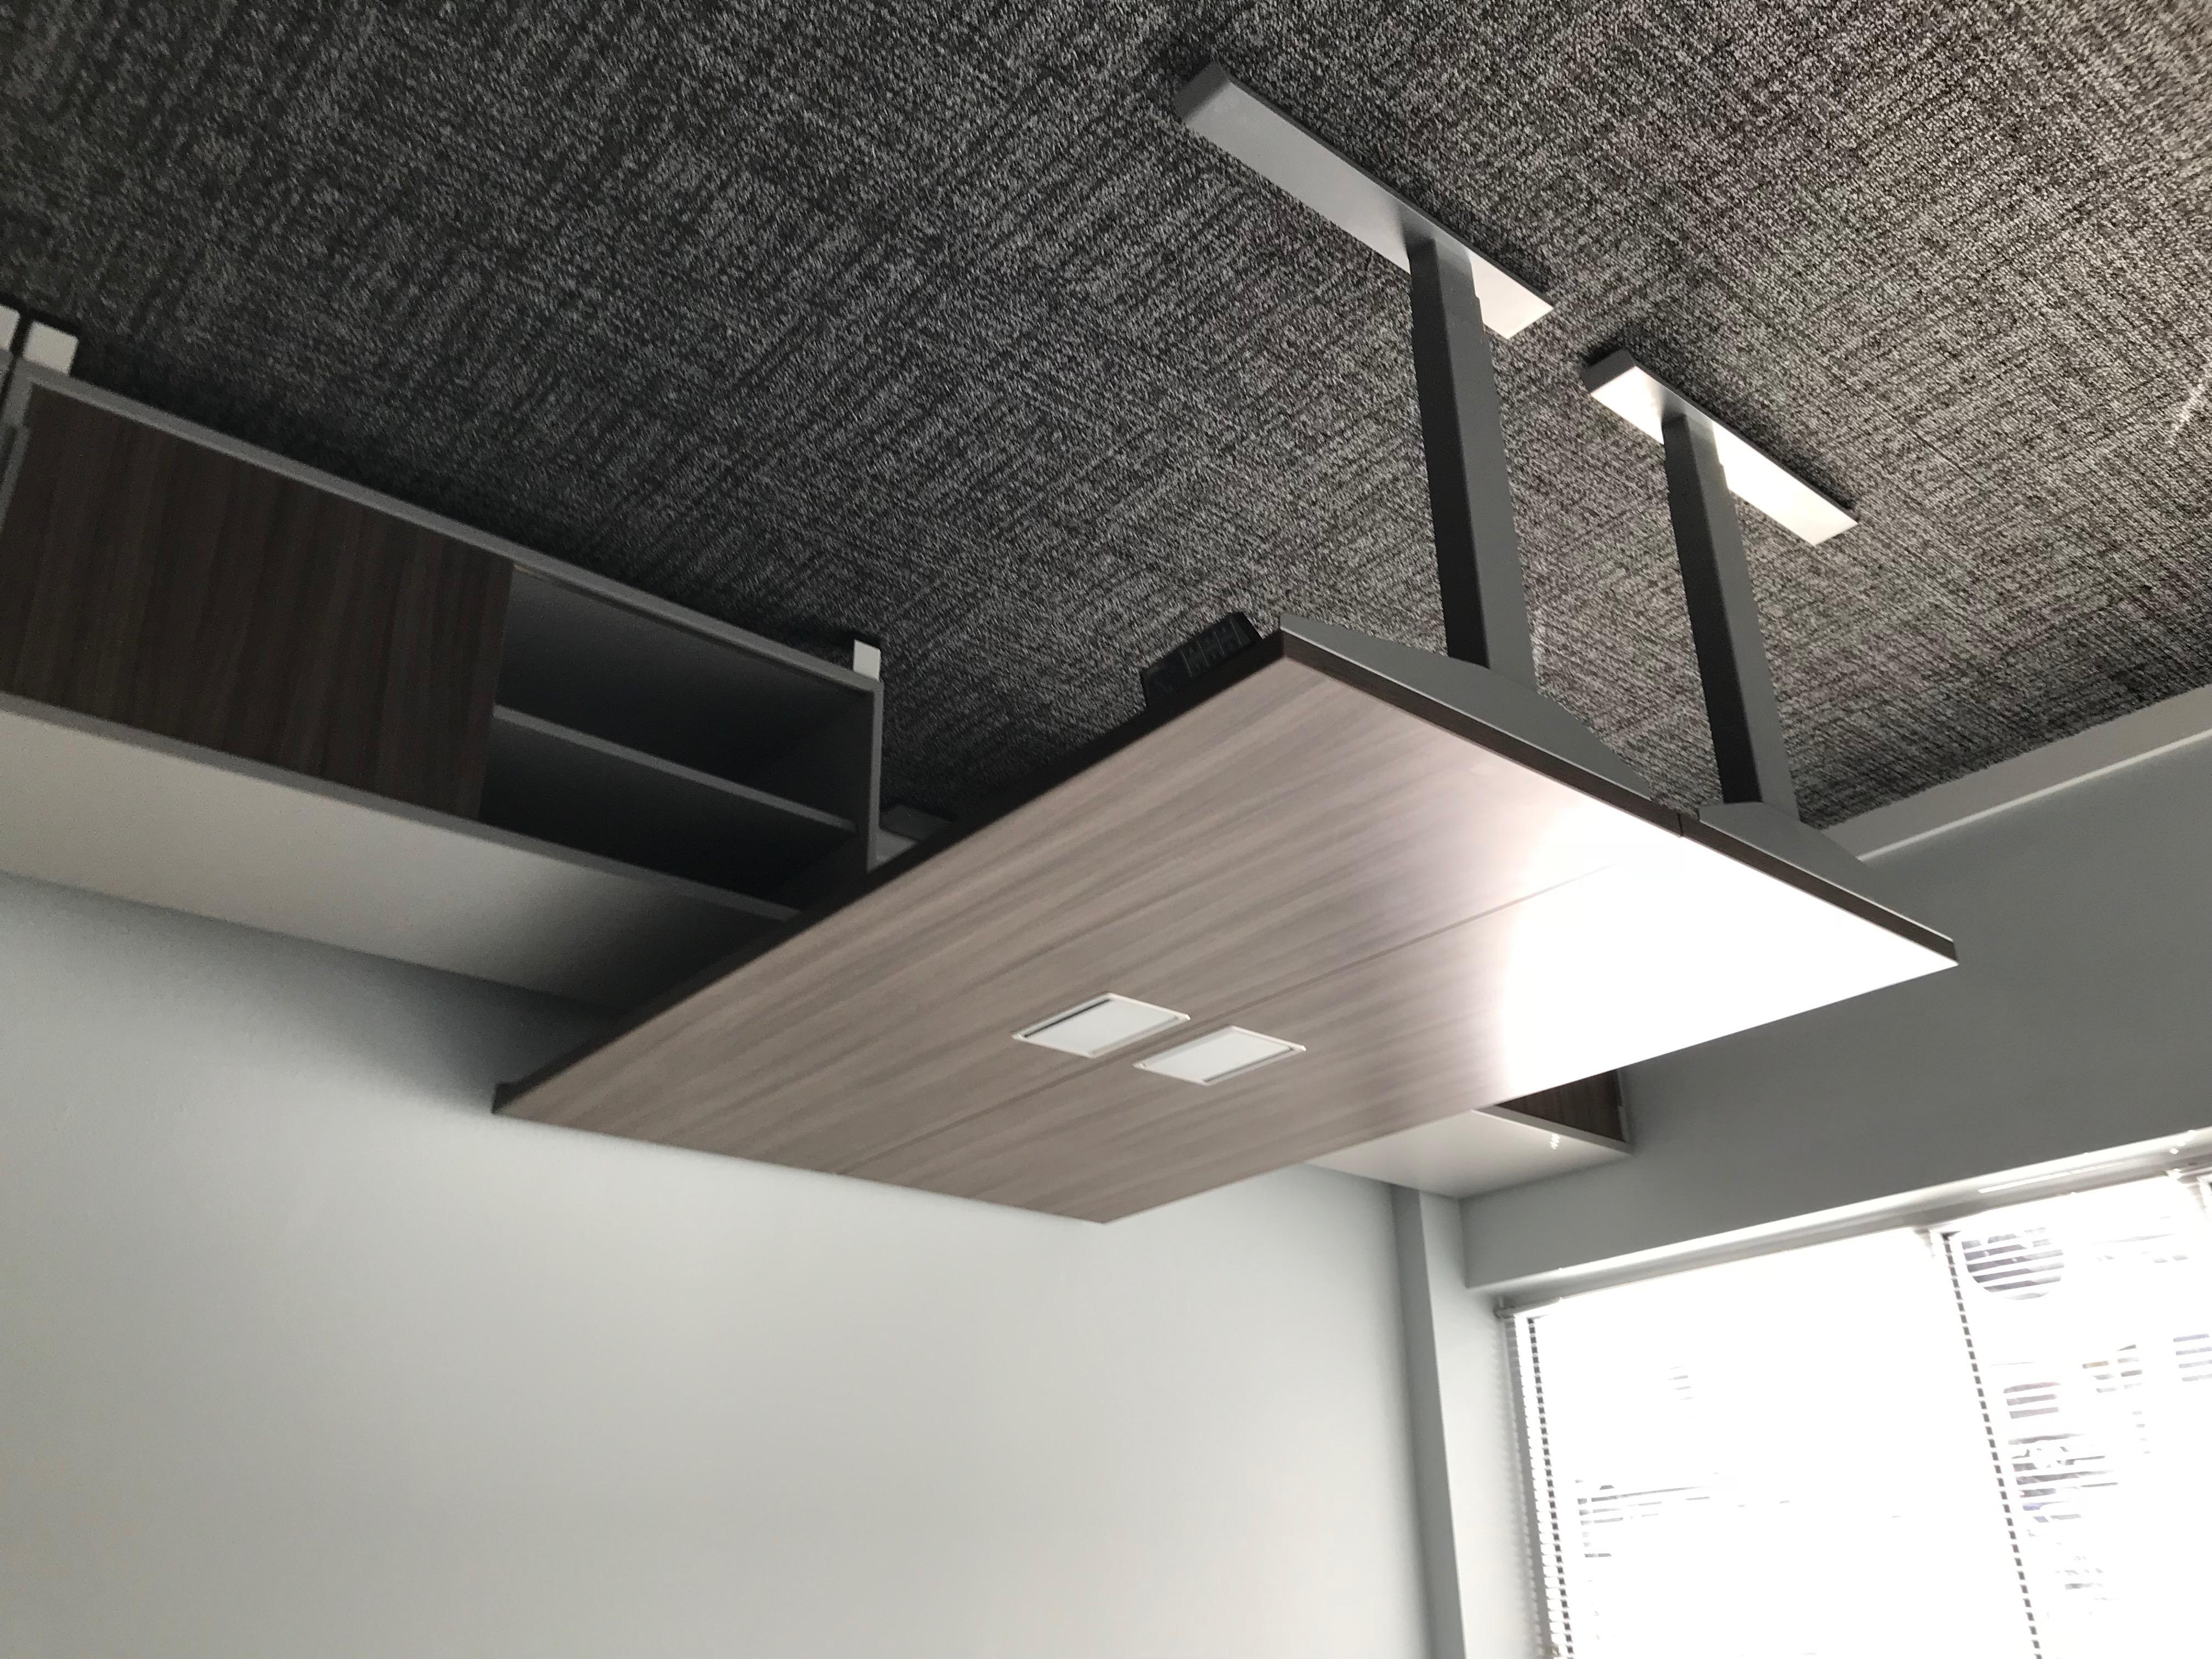 manasota-office-supplies-llc-adjustable-tables-in-bradenton-florida-manasota-office-supplies-llc-10-.jpg